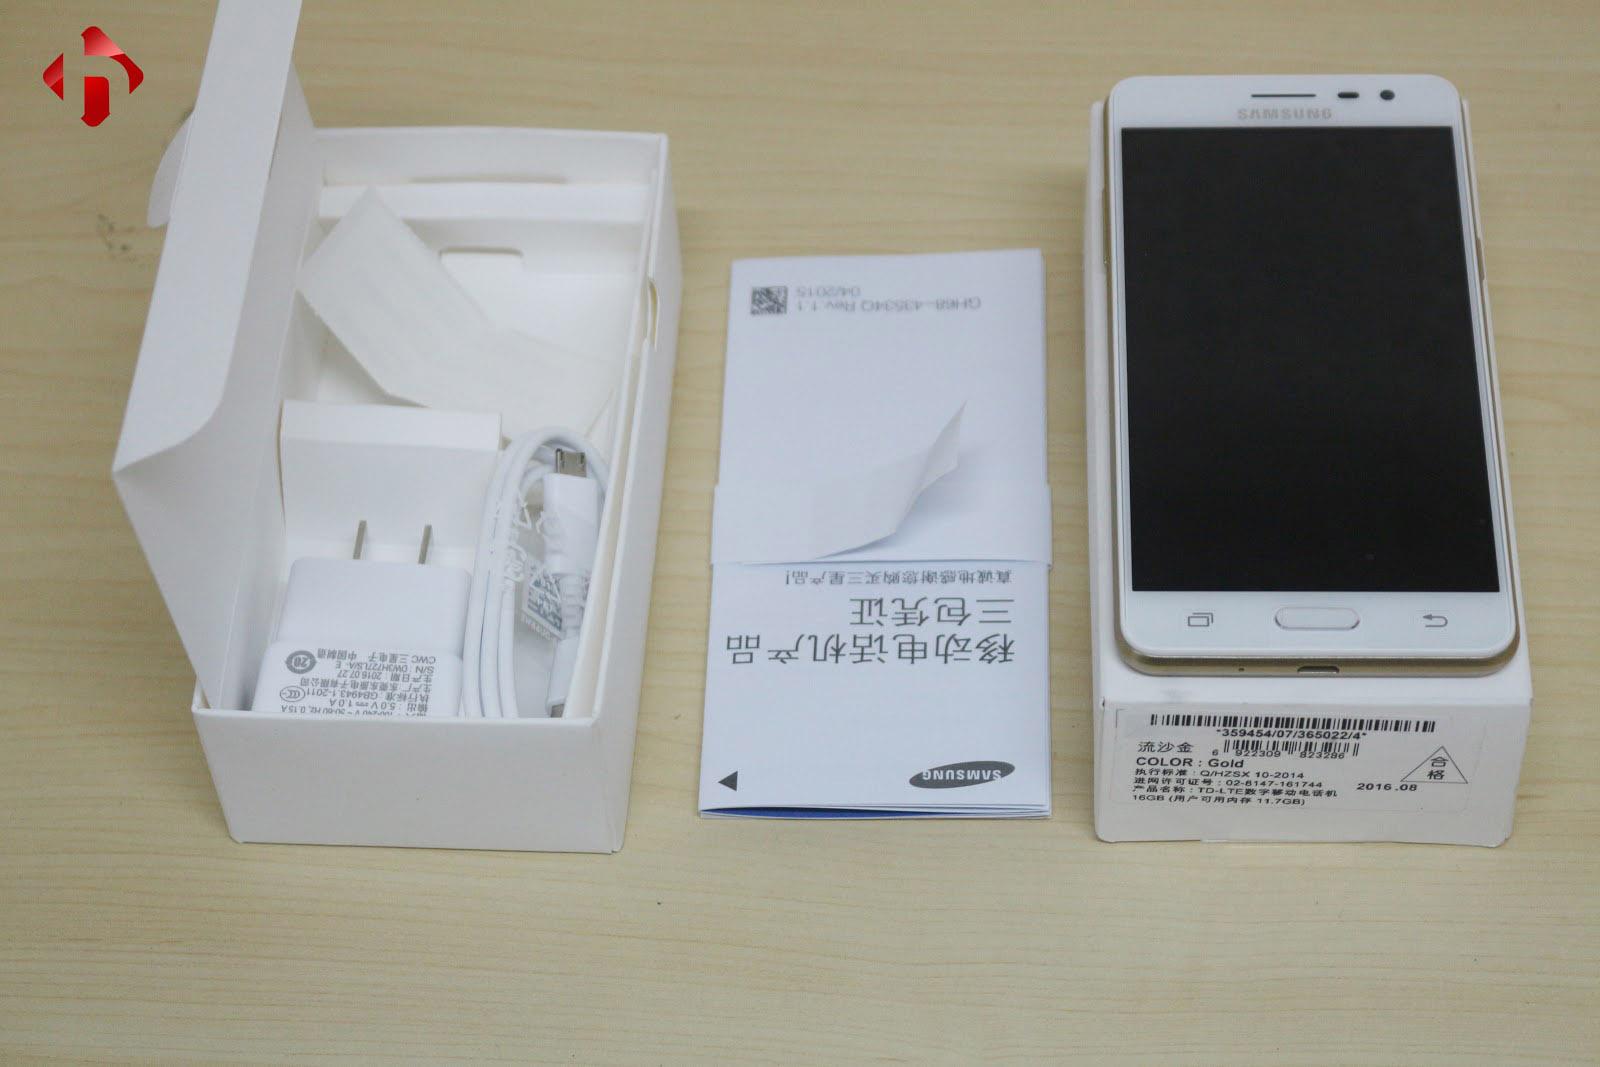 Samsung Galaxy J3 Pro fullbox